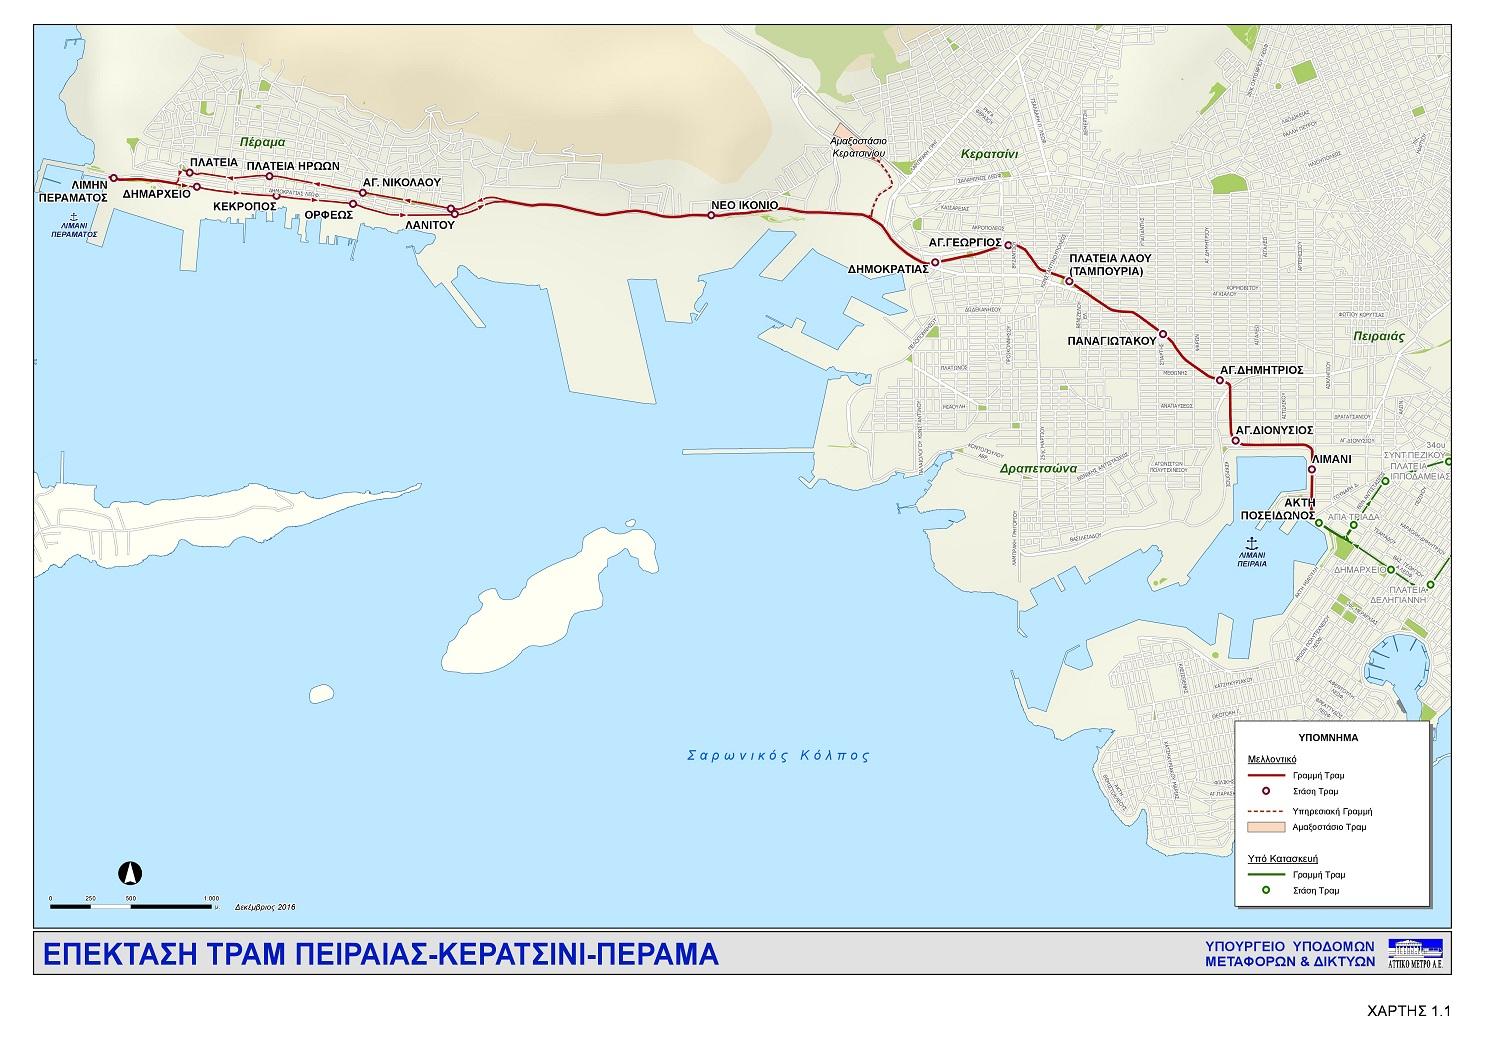 Xarths Epektashs Tram Pros Keratsini Perama Athens Transport